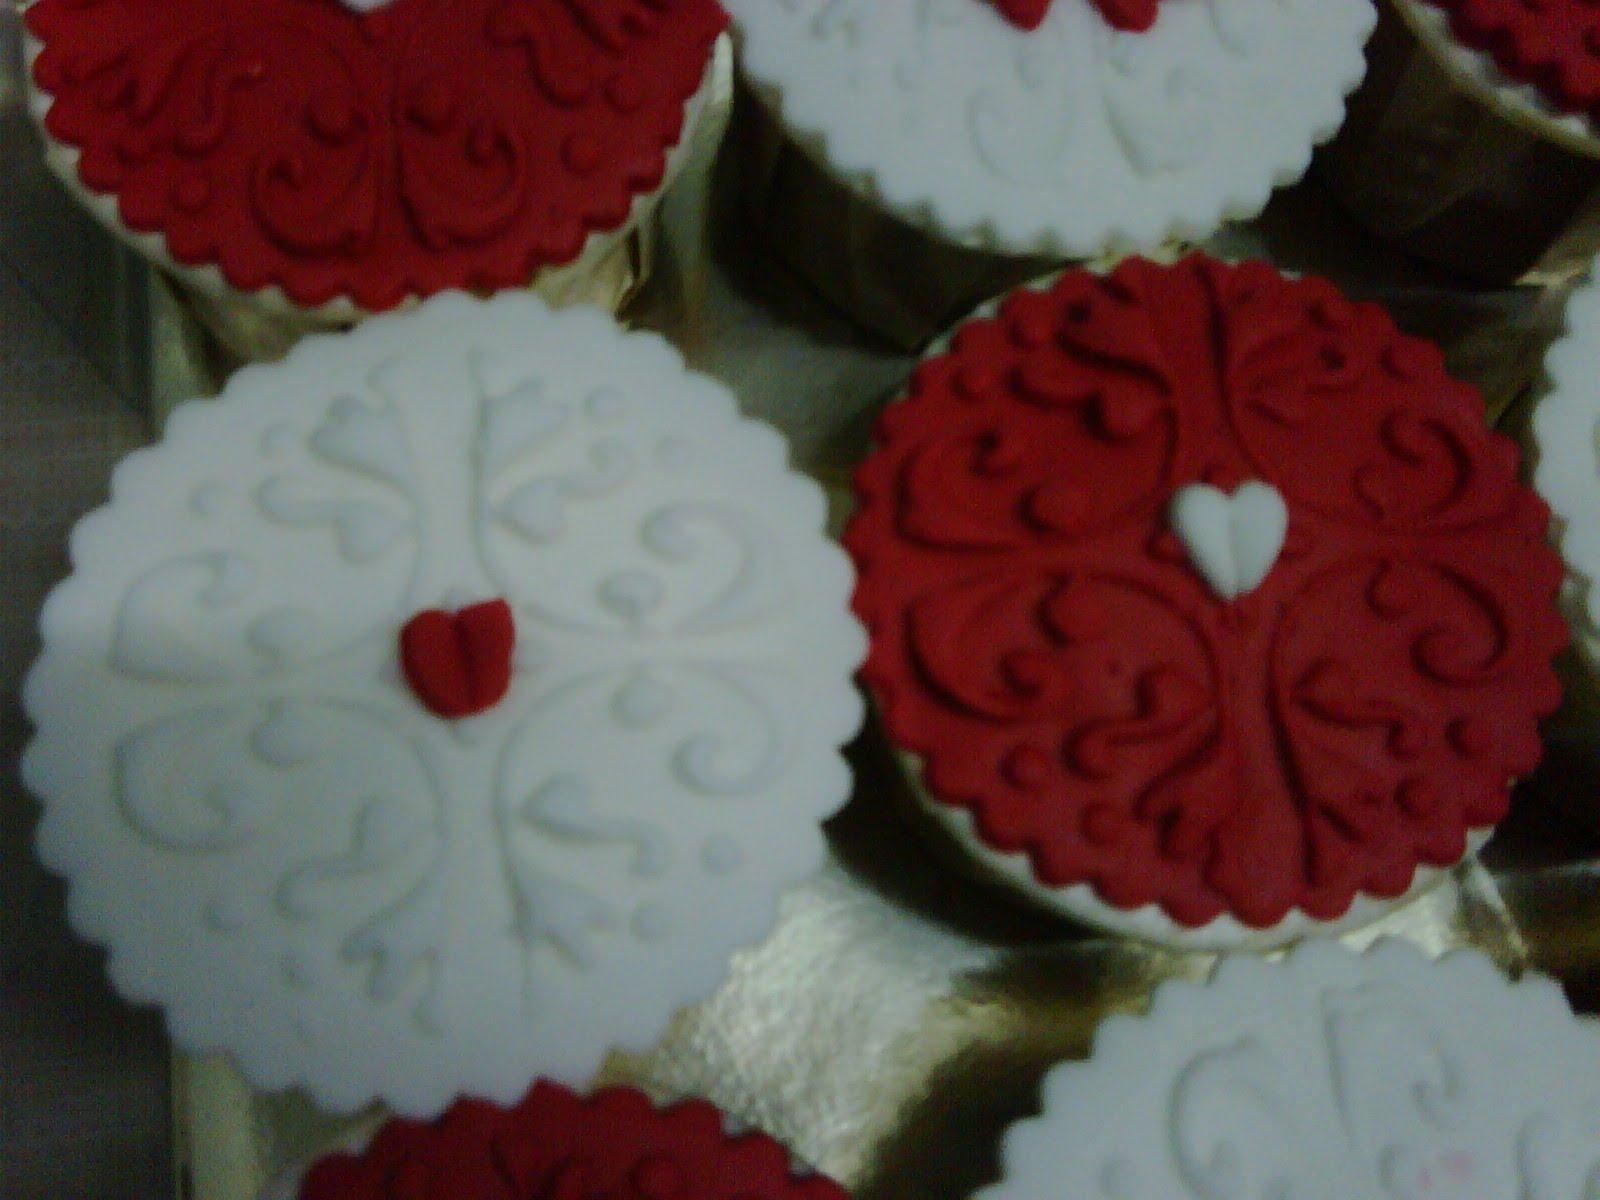 http://1.bp.blogspot.com/_scLgFtYjYfc/S-DbDcZ9wqI/AAAAAAAAAGQ/wbLdOrEitdQ/s1600/New+Image.JPG